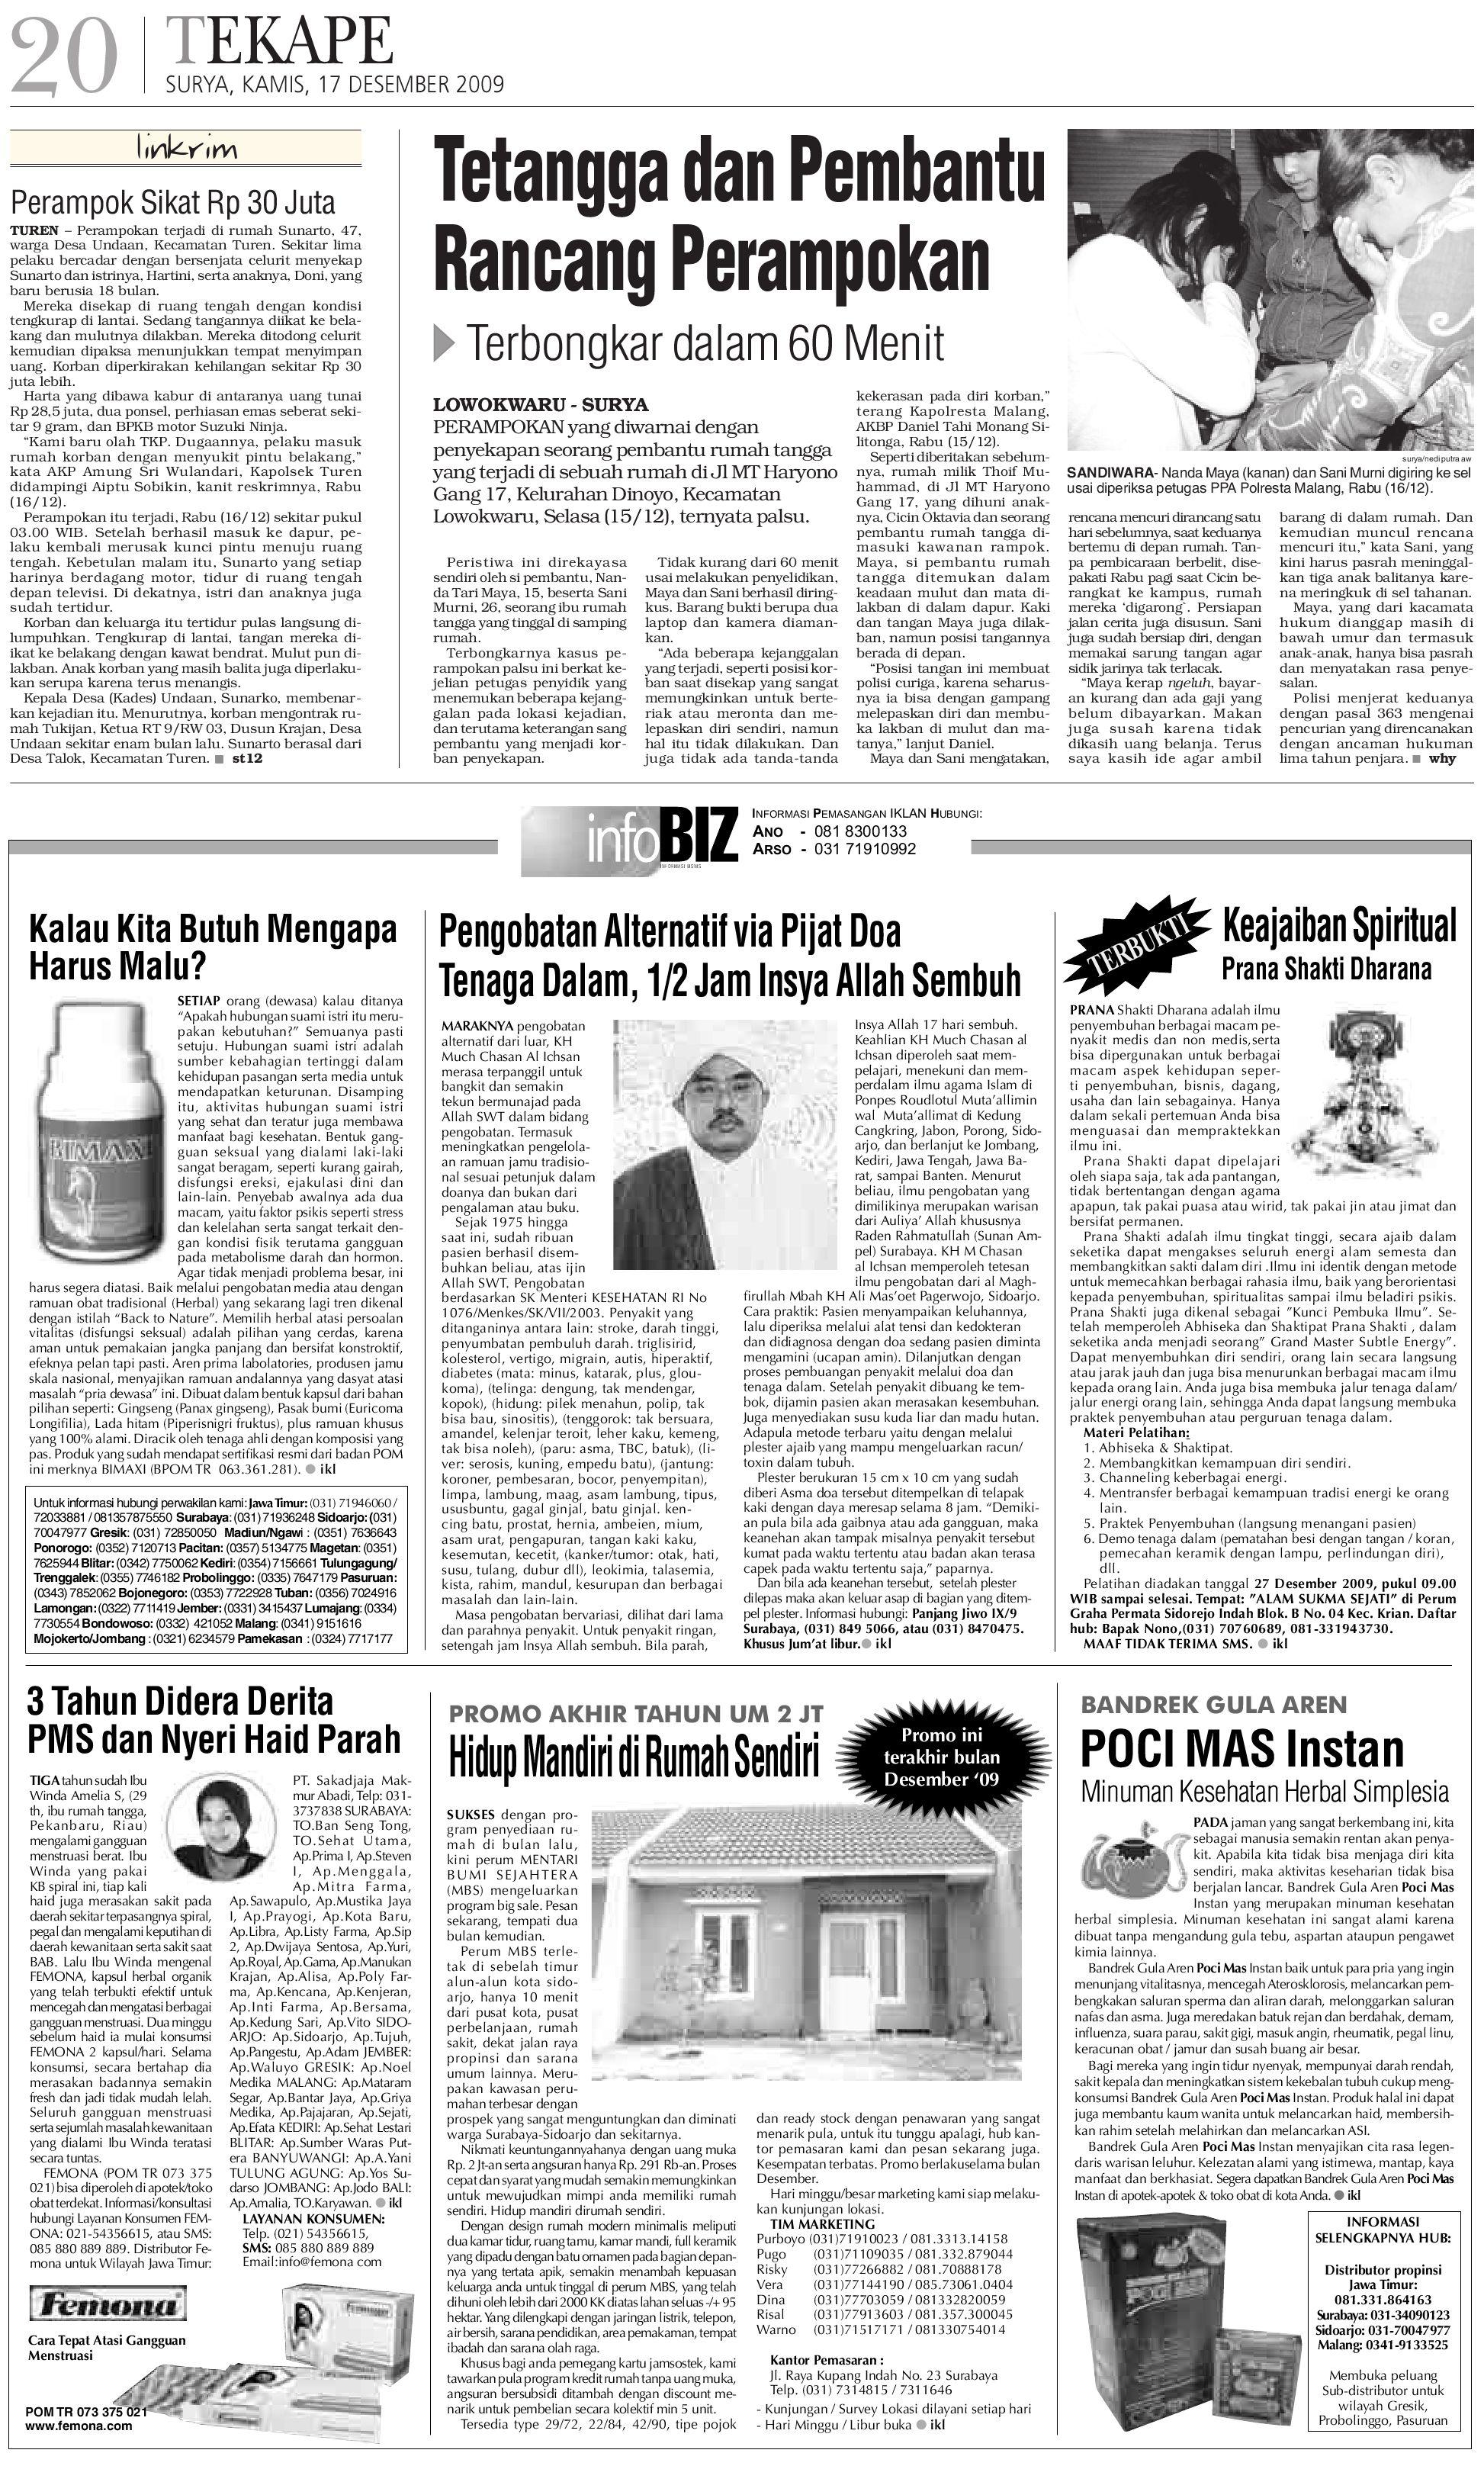 Surya Edisi Cetak 17 Des 2009 By Harian Issuu Bendrat Ajaib